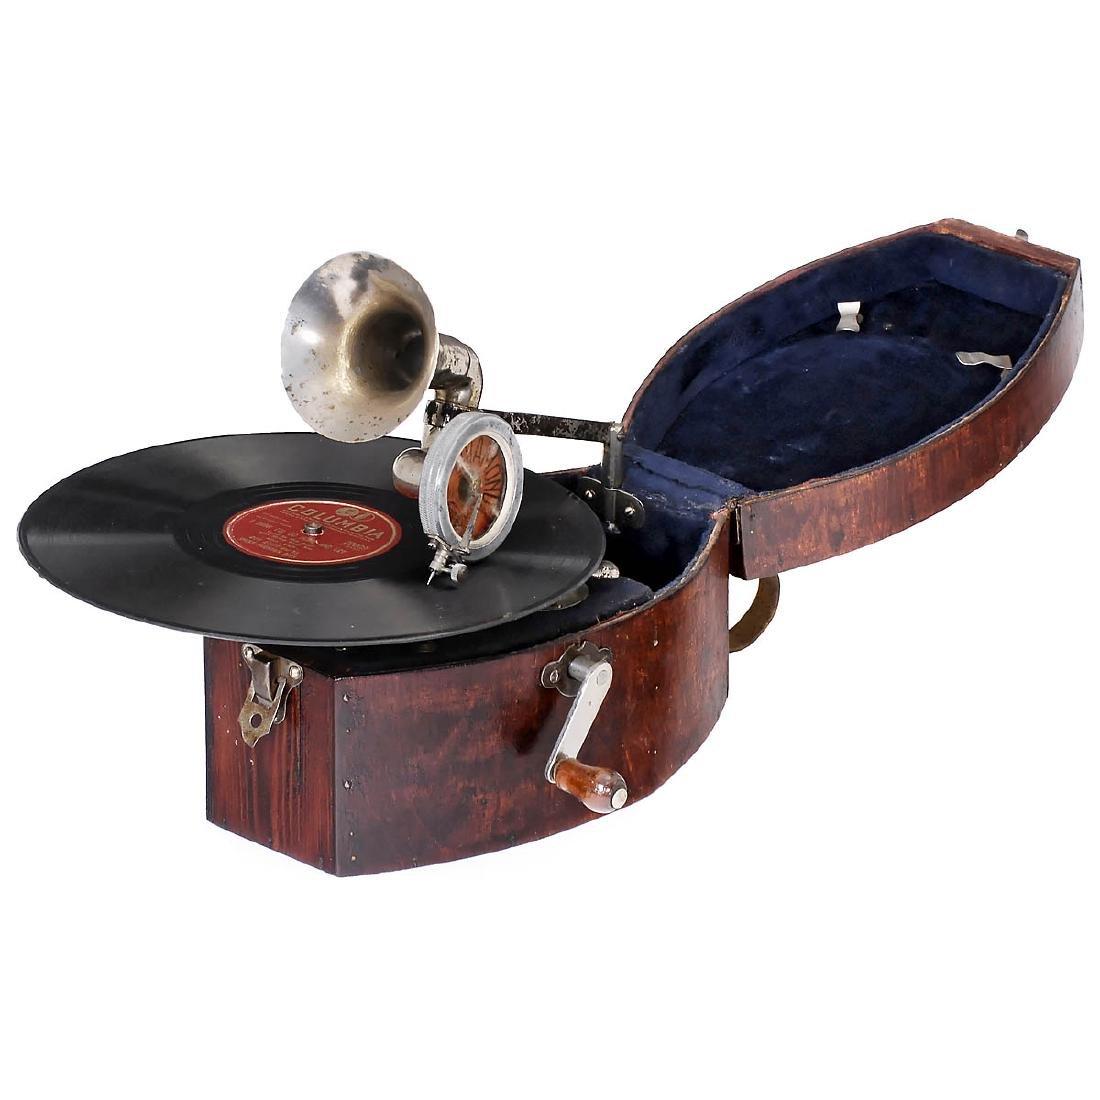 Small Portable Gramophone, c. 1930